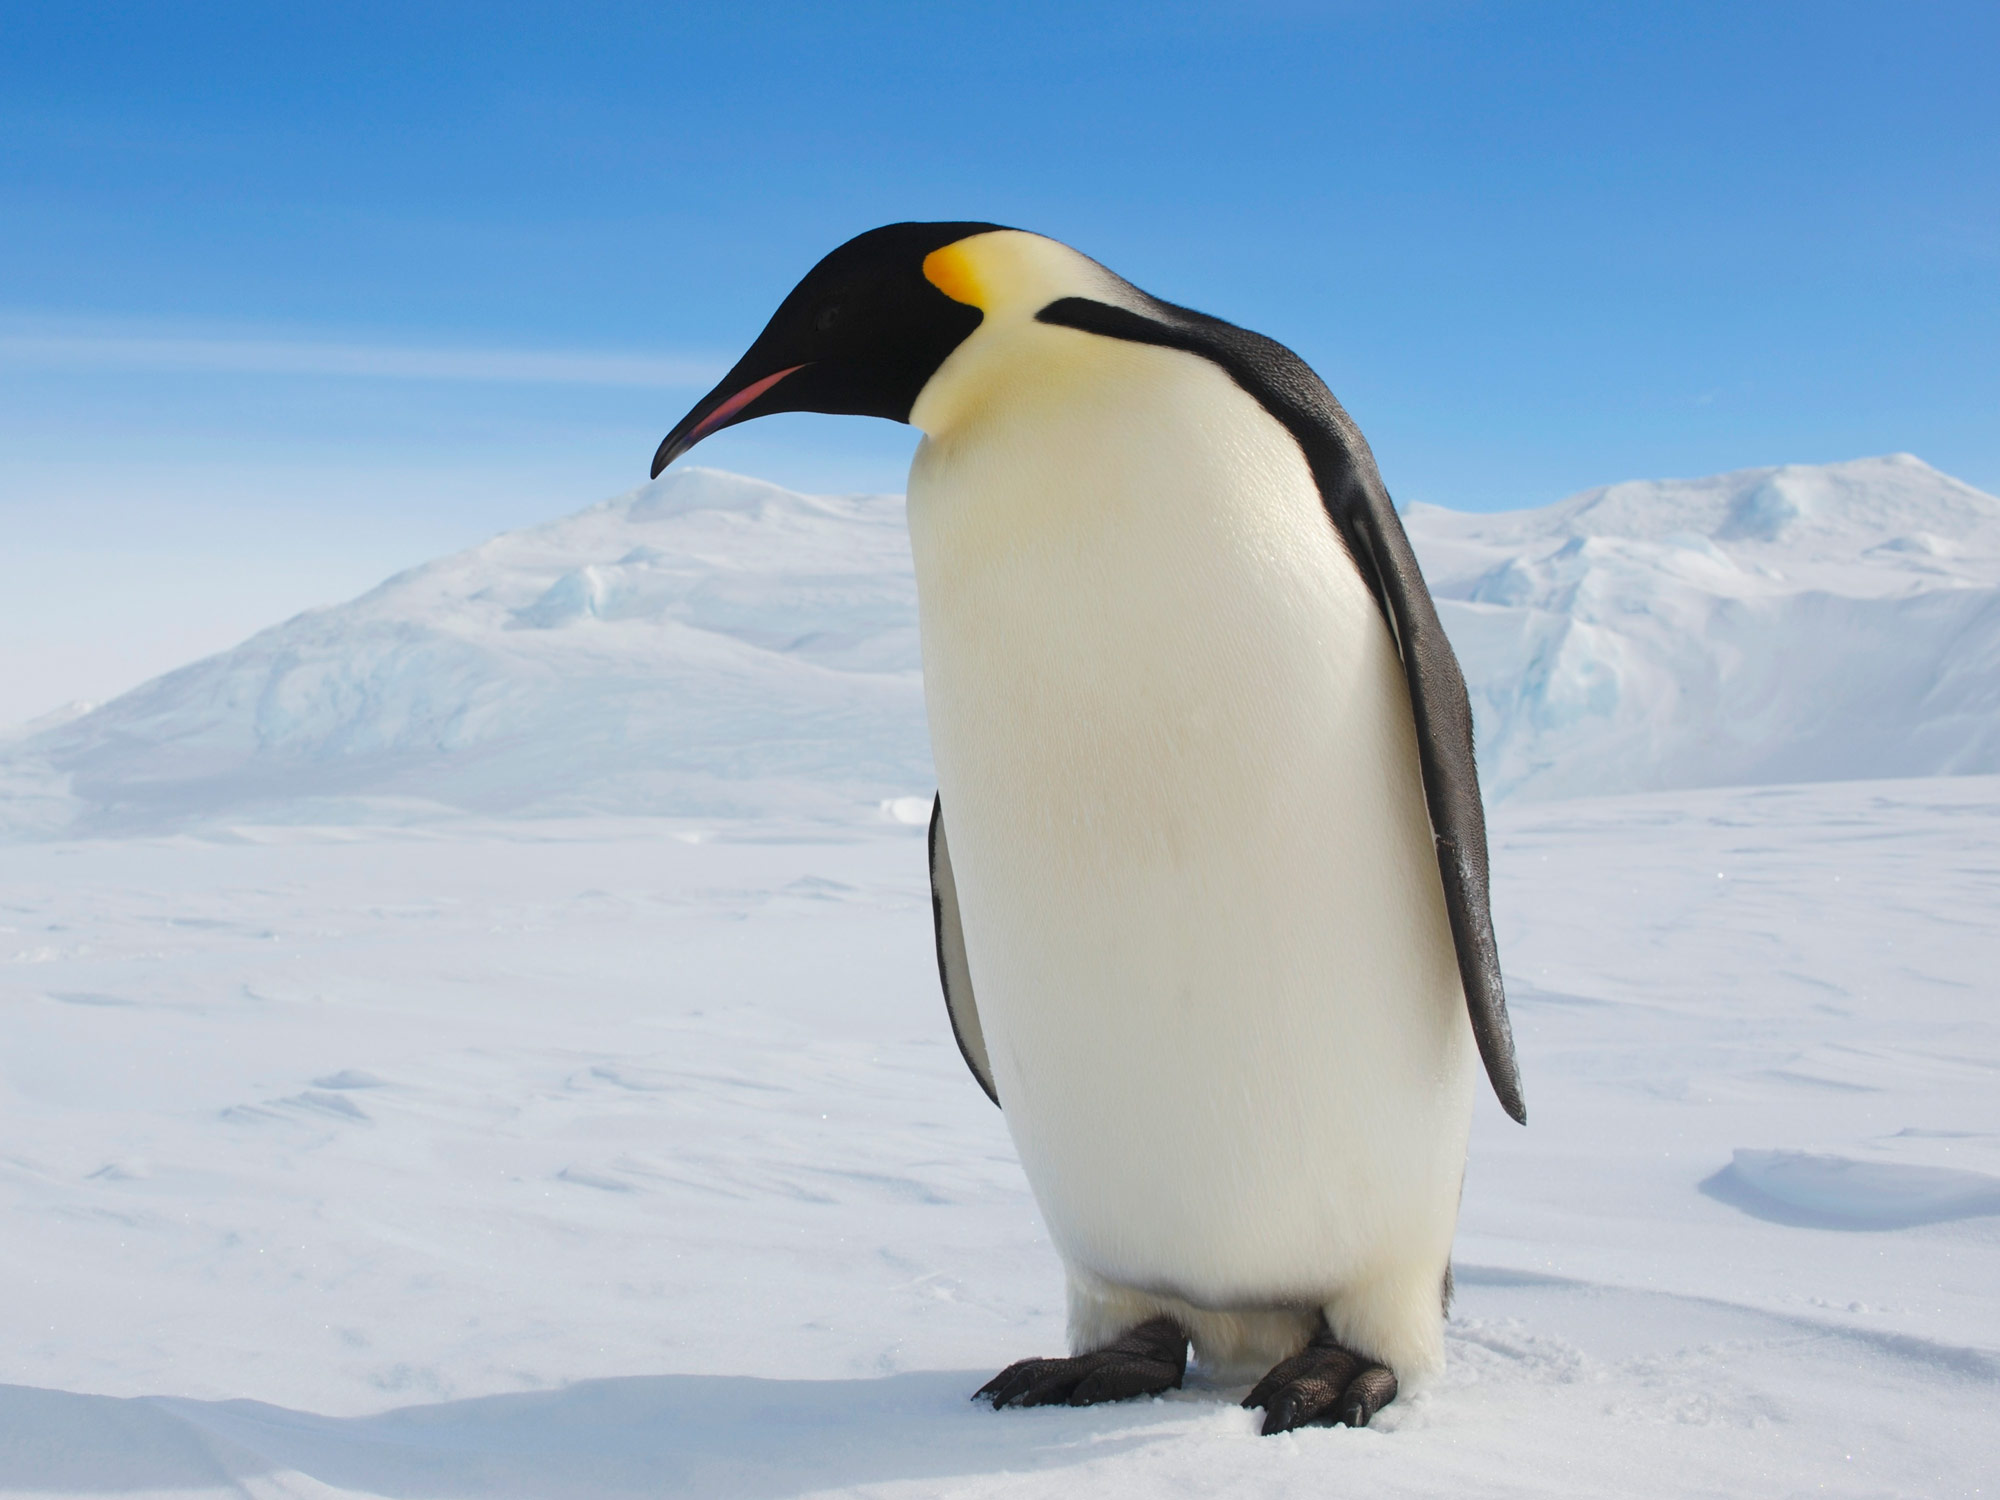 Major Emperor Penguin Breeding Ground Gone Barren Since 2016 - Bloomberg